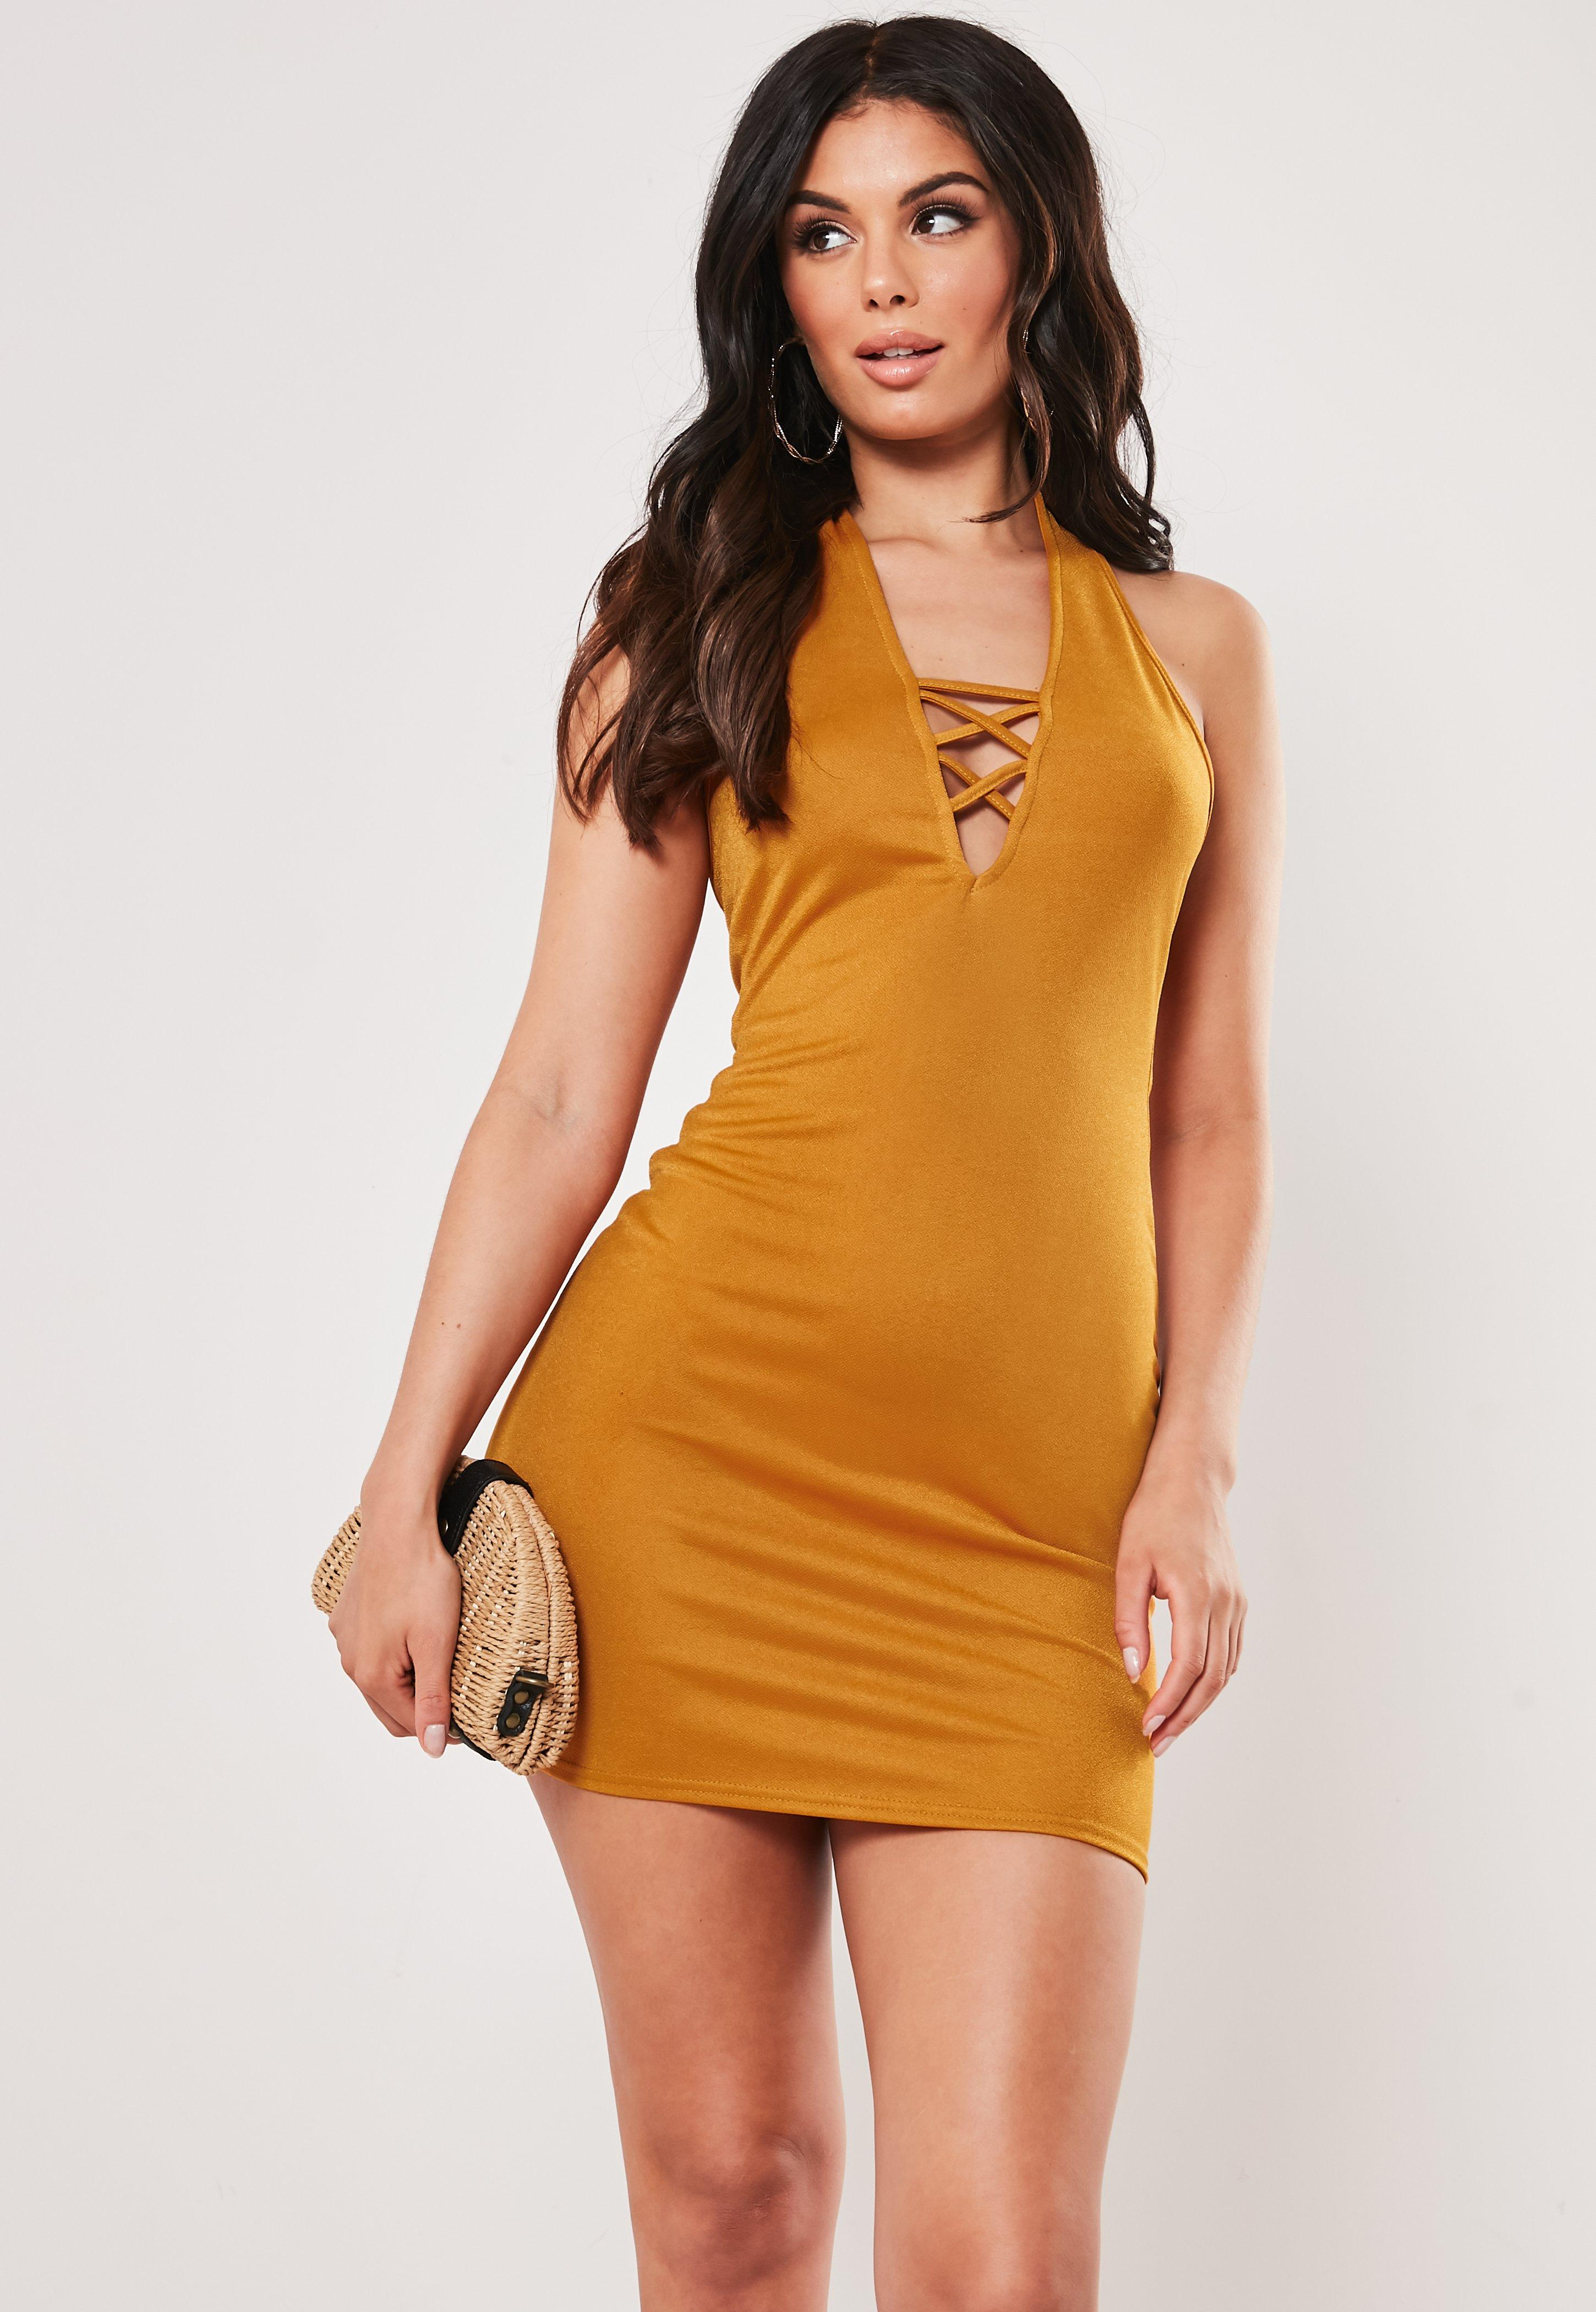 979f3456d872 Backless Dresses - Open   Low Back Dresses